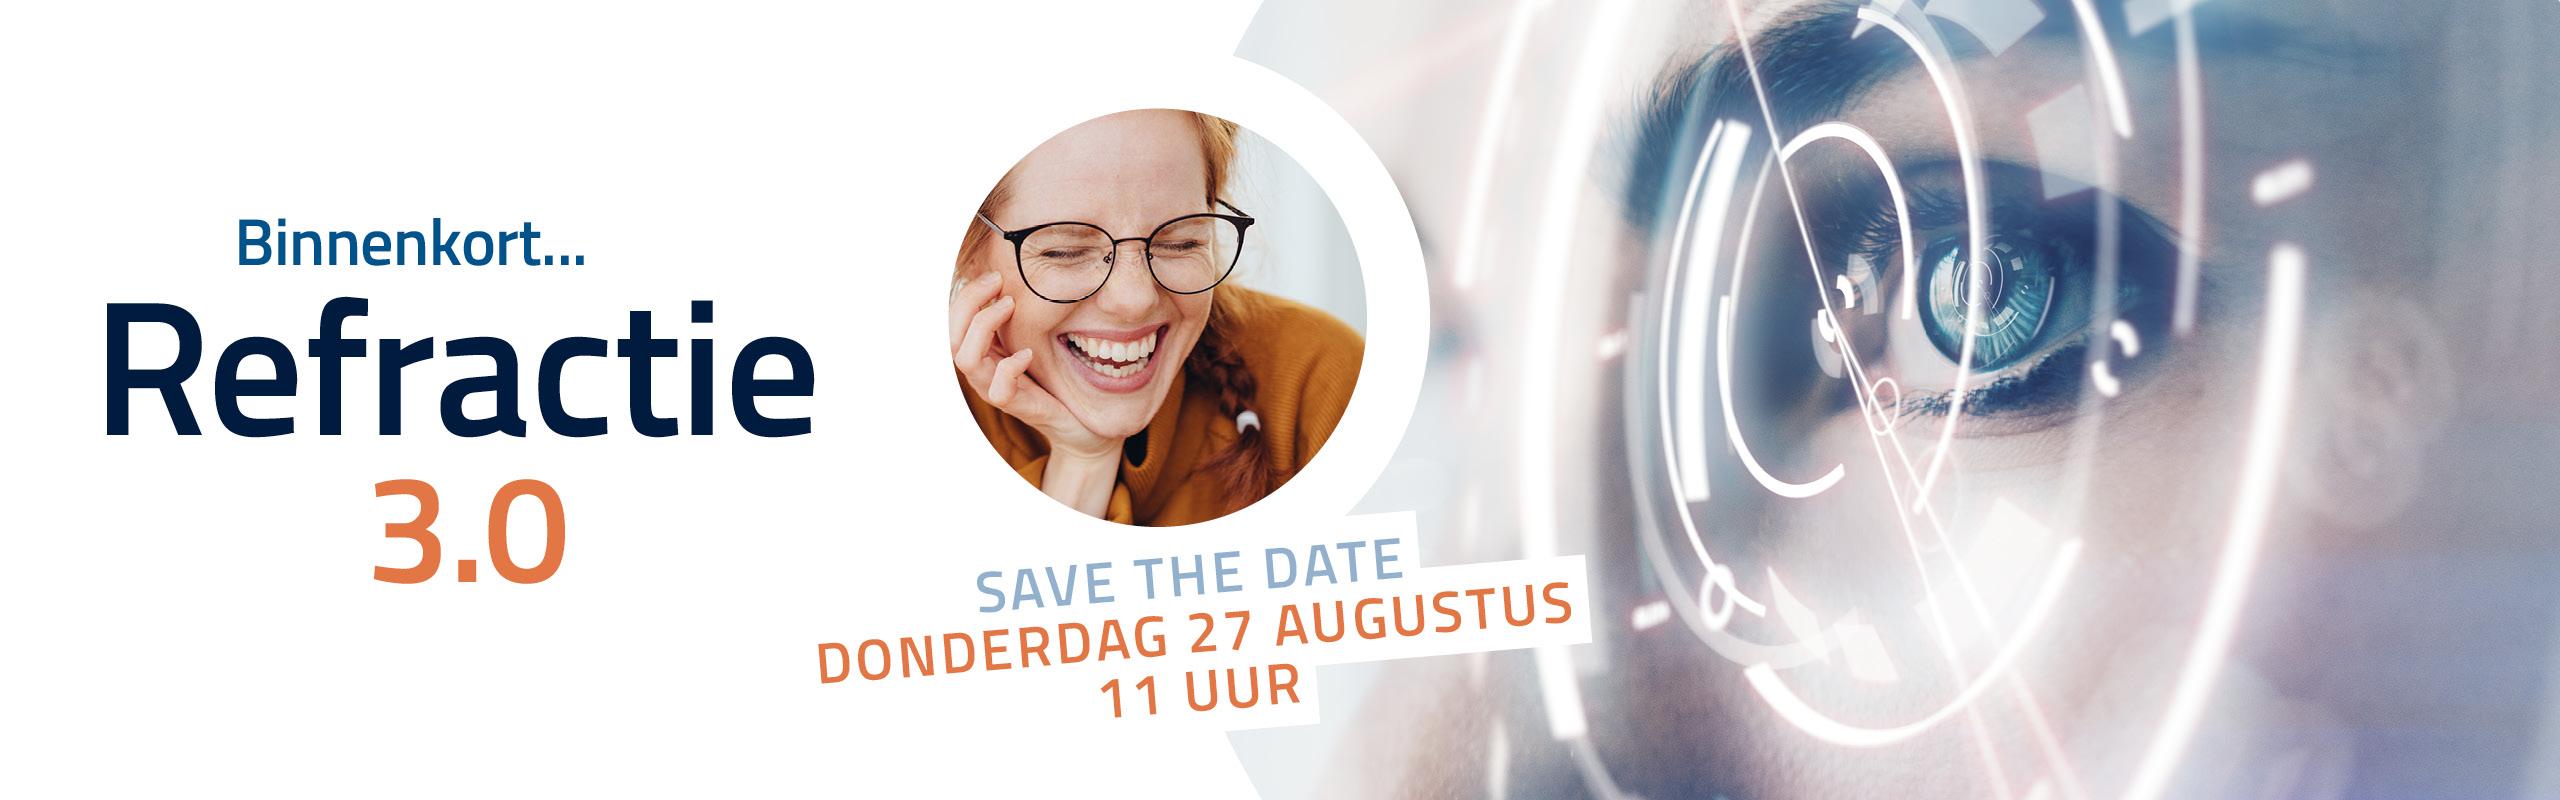 save-the-date-refractie-3.0-27-augustus-2020